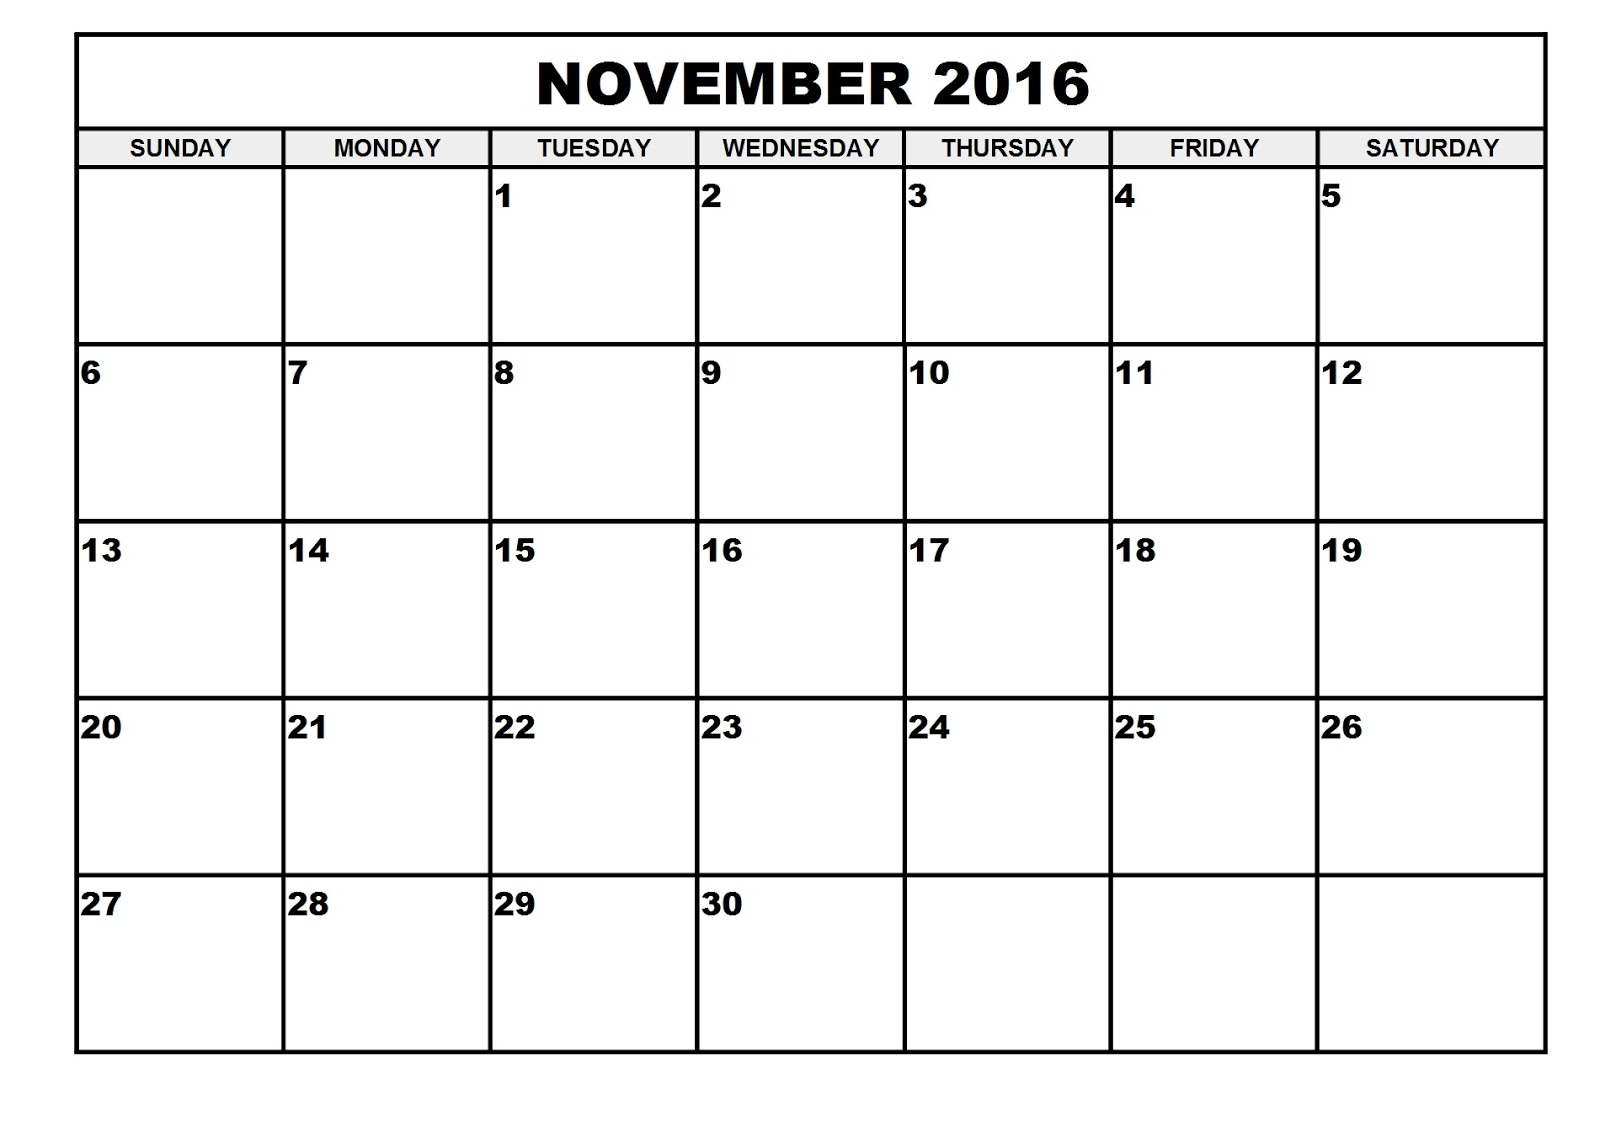 Daily Calendar November 2016 : November blank printable calendar